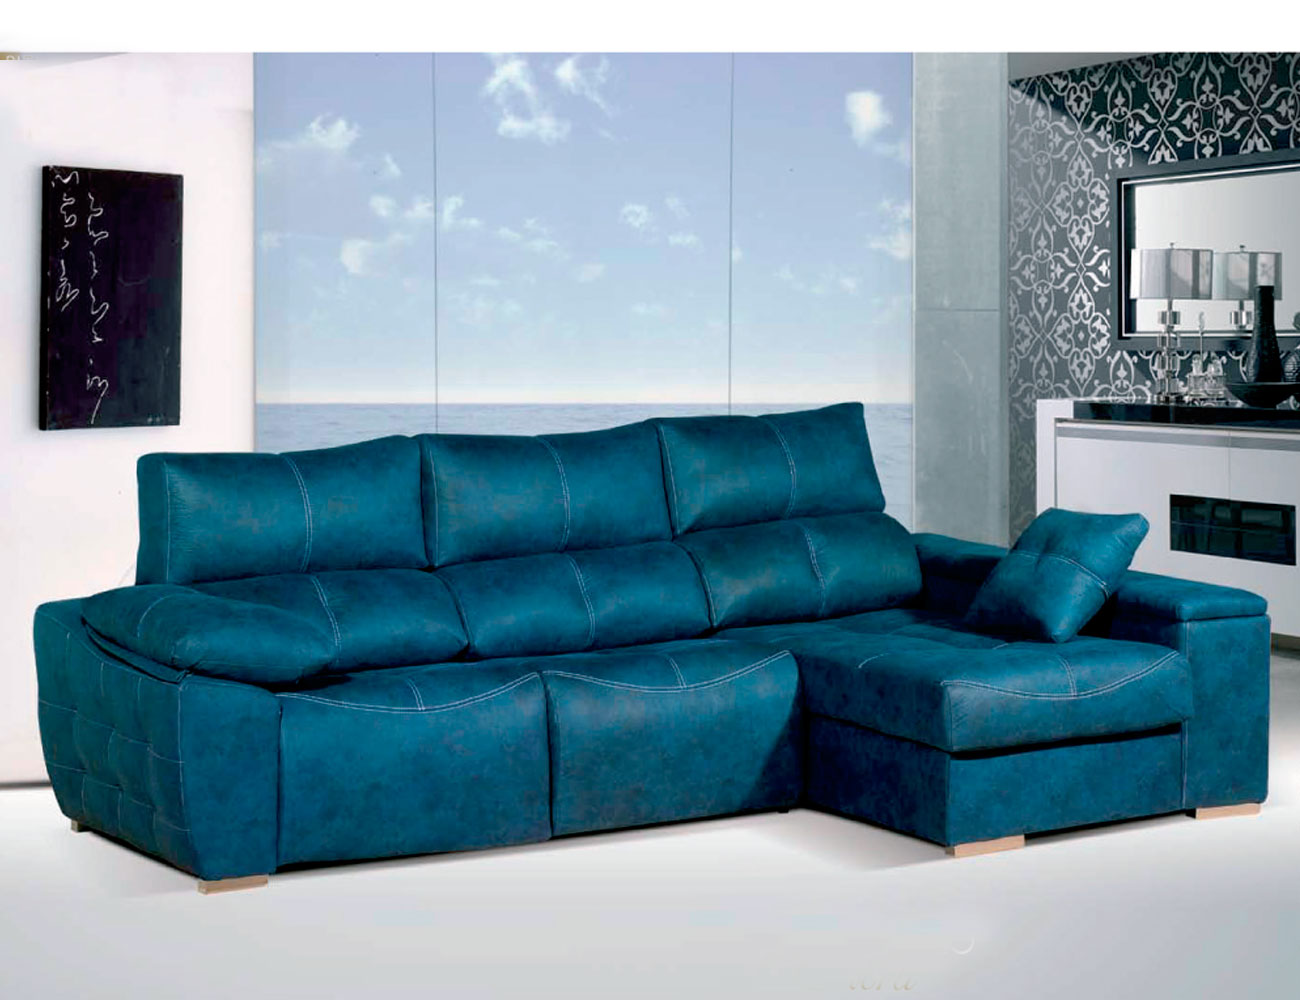 Sofa chaiselongue relax 2 motores anti manchas turquesa10